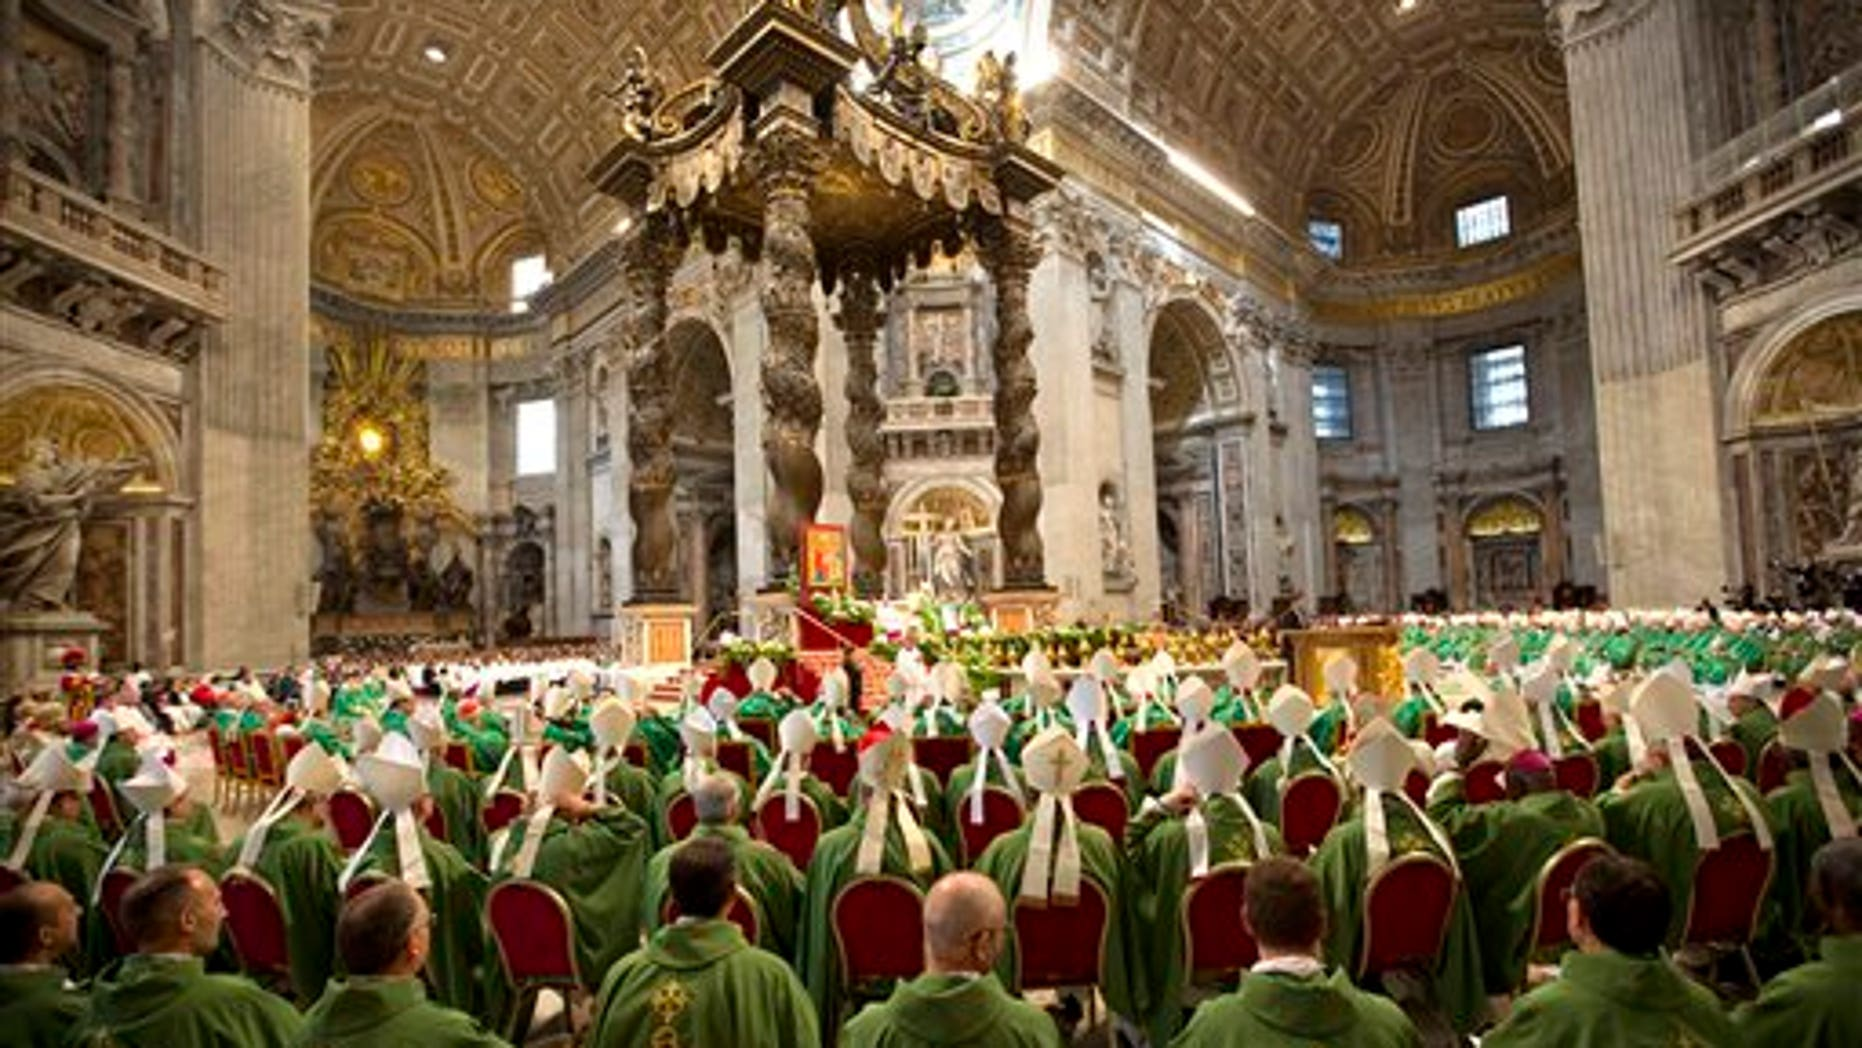 St. Peter's Basilica at the Vatican on Sunday. (AP Photo/Alessandra Tarantino)